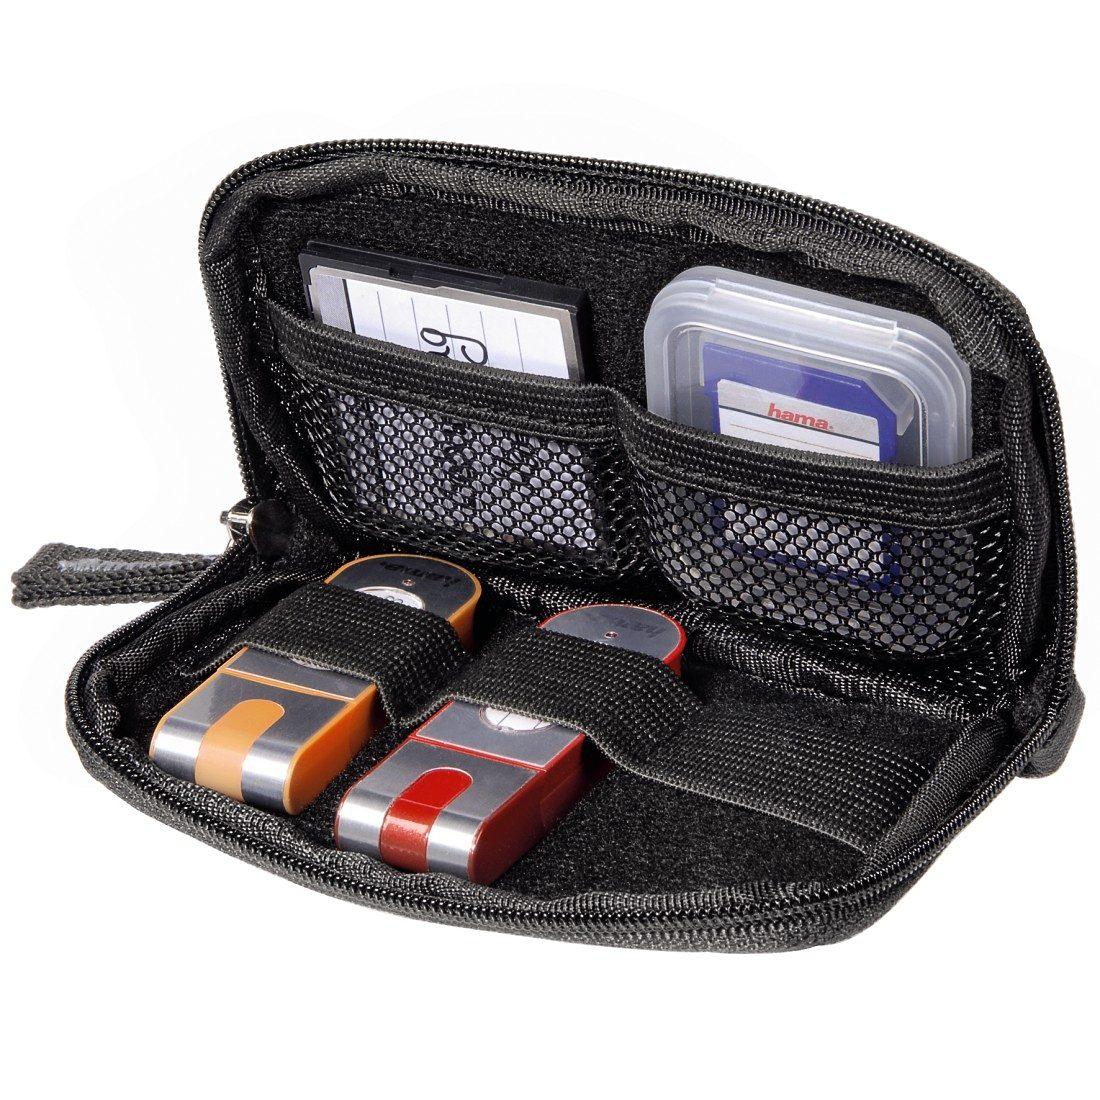 Hama Memory Card-/USB-Stick-Tasche Orlando, Schwarz